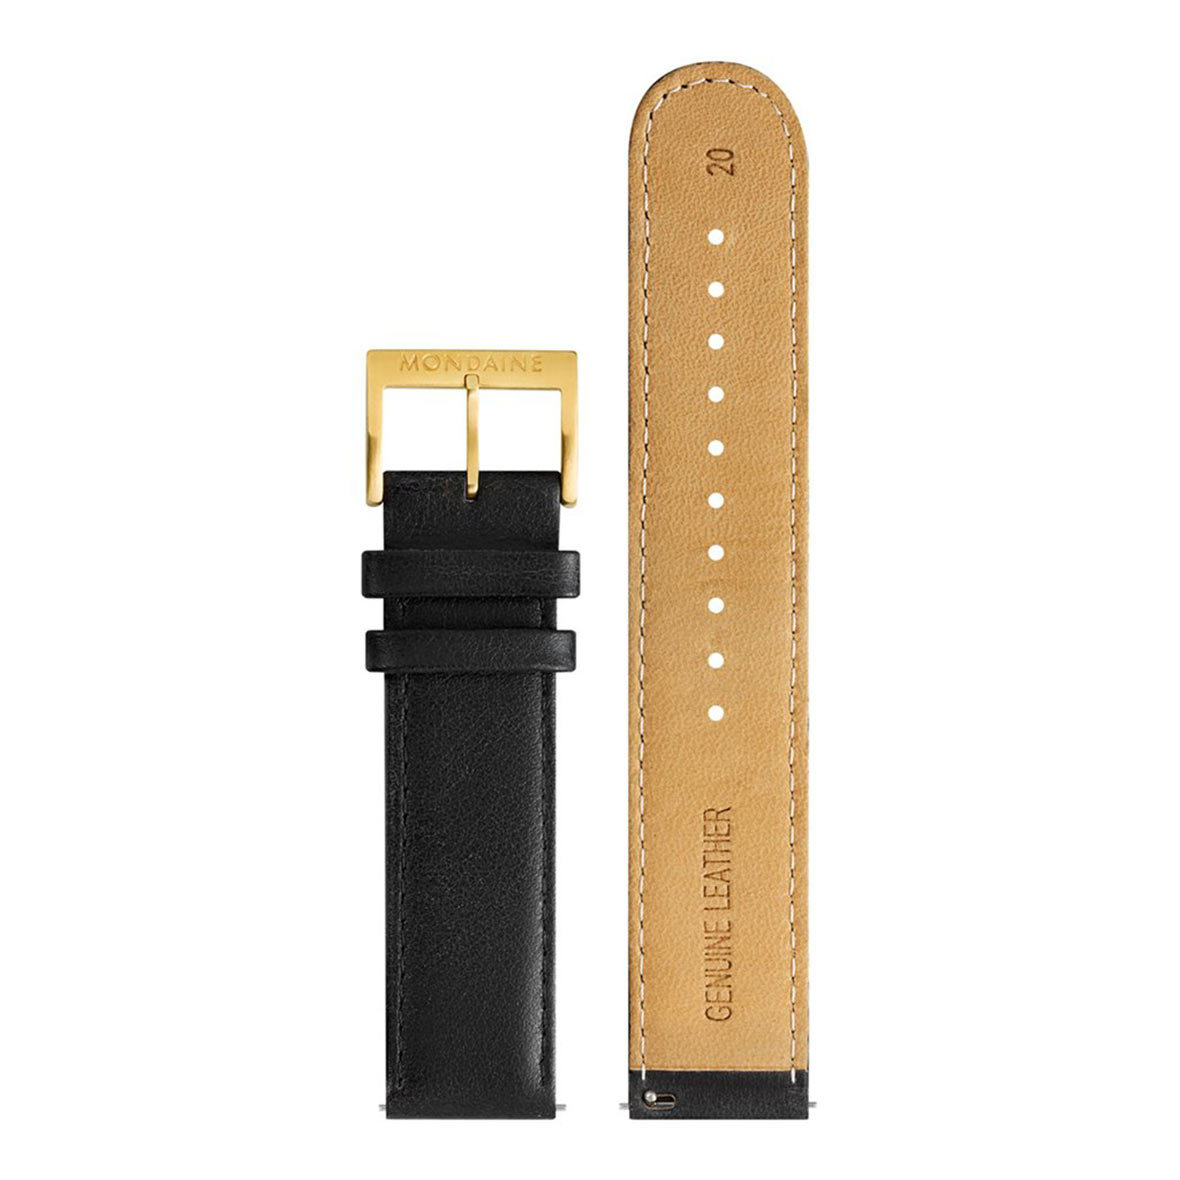 armbandurh evo2 gold lederband mondaine